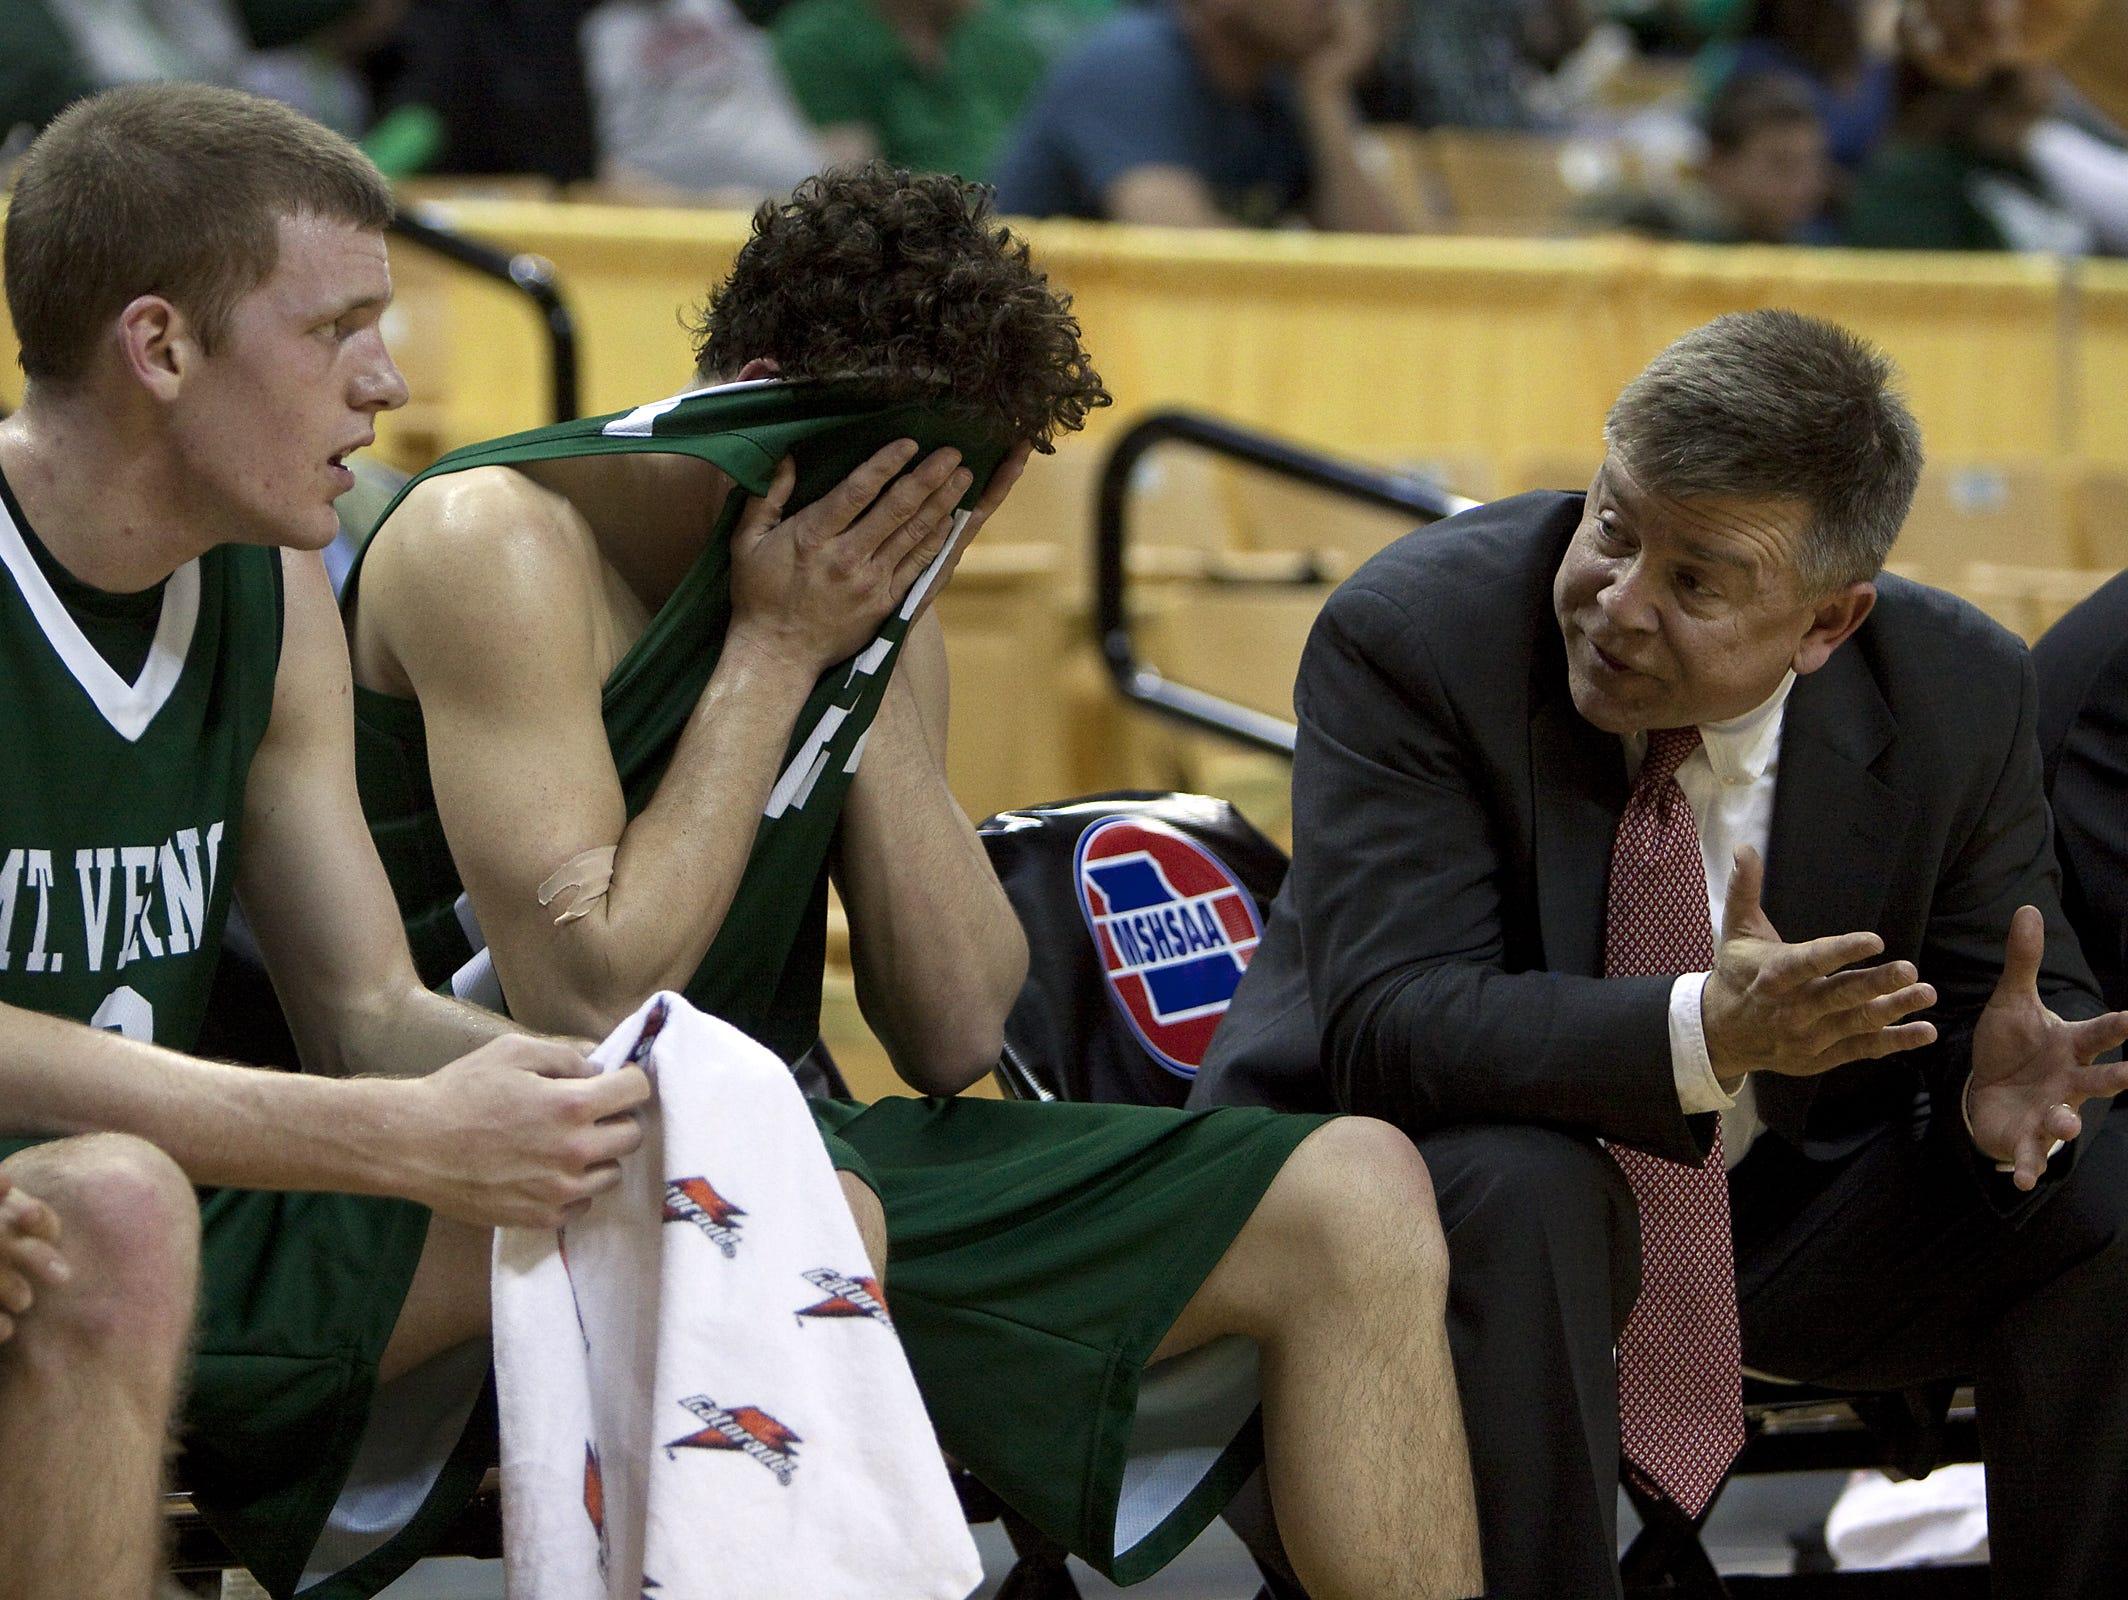 Skip Brock, right, spent 19 seasons coaching boys basketball at Mt. Vernon High School.